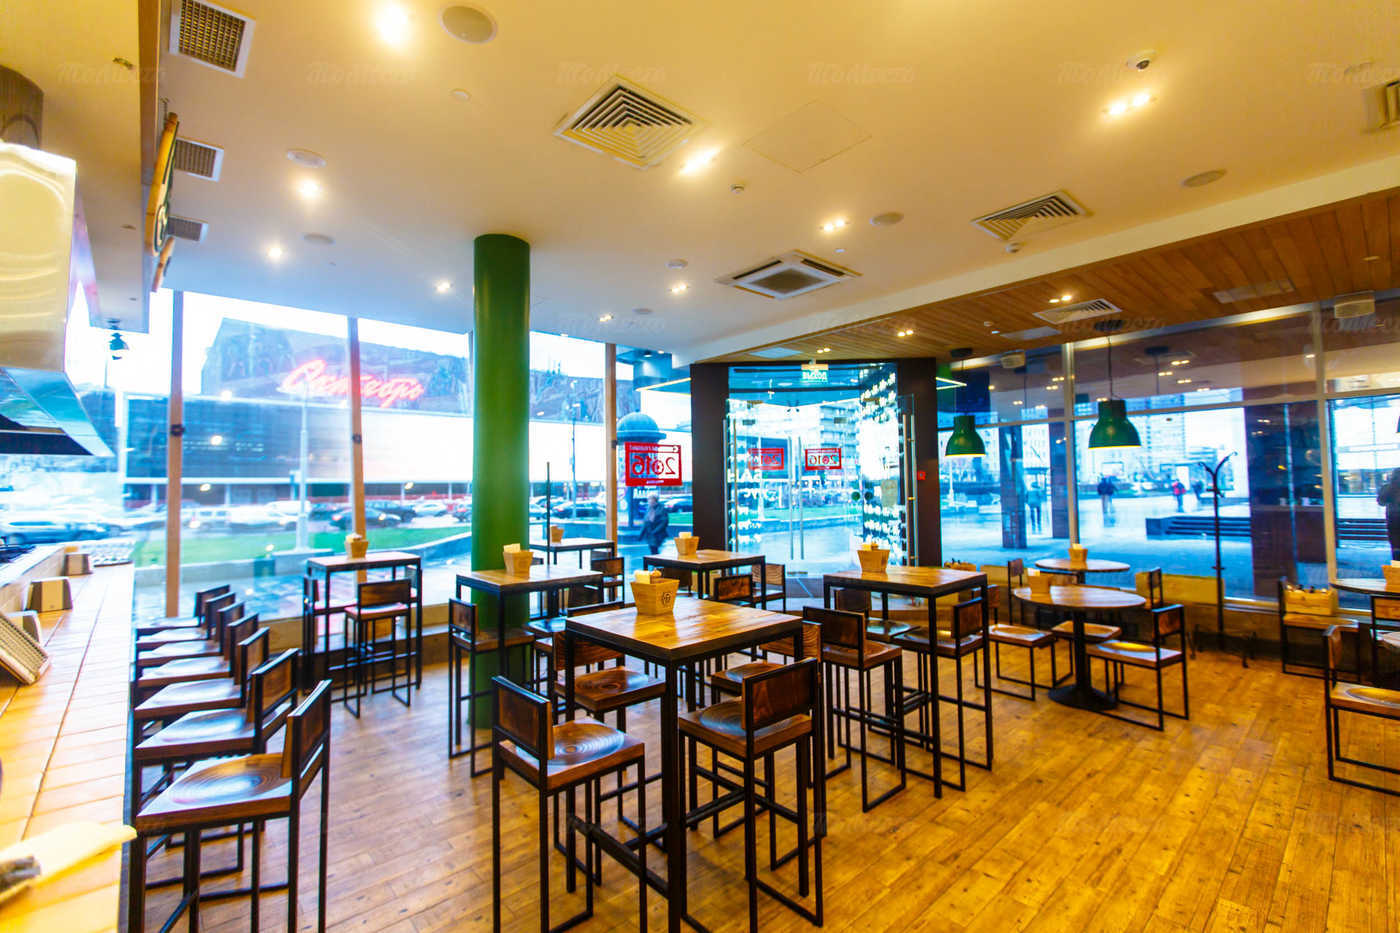 Меню ресторана Чабан хаус на Новом Арбате